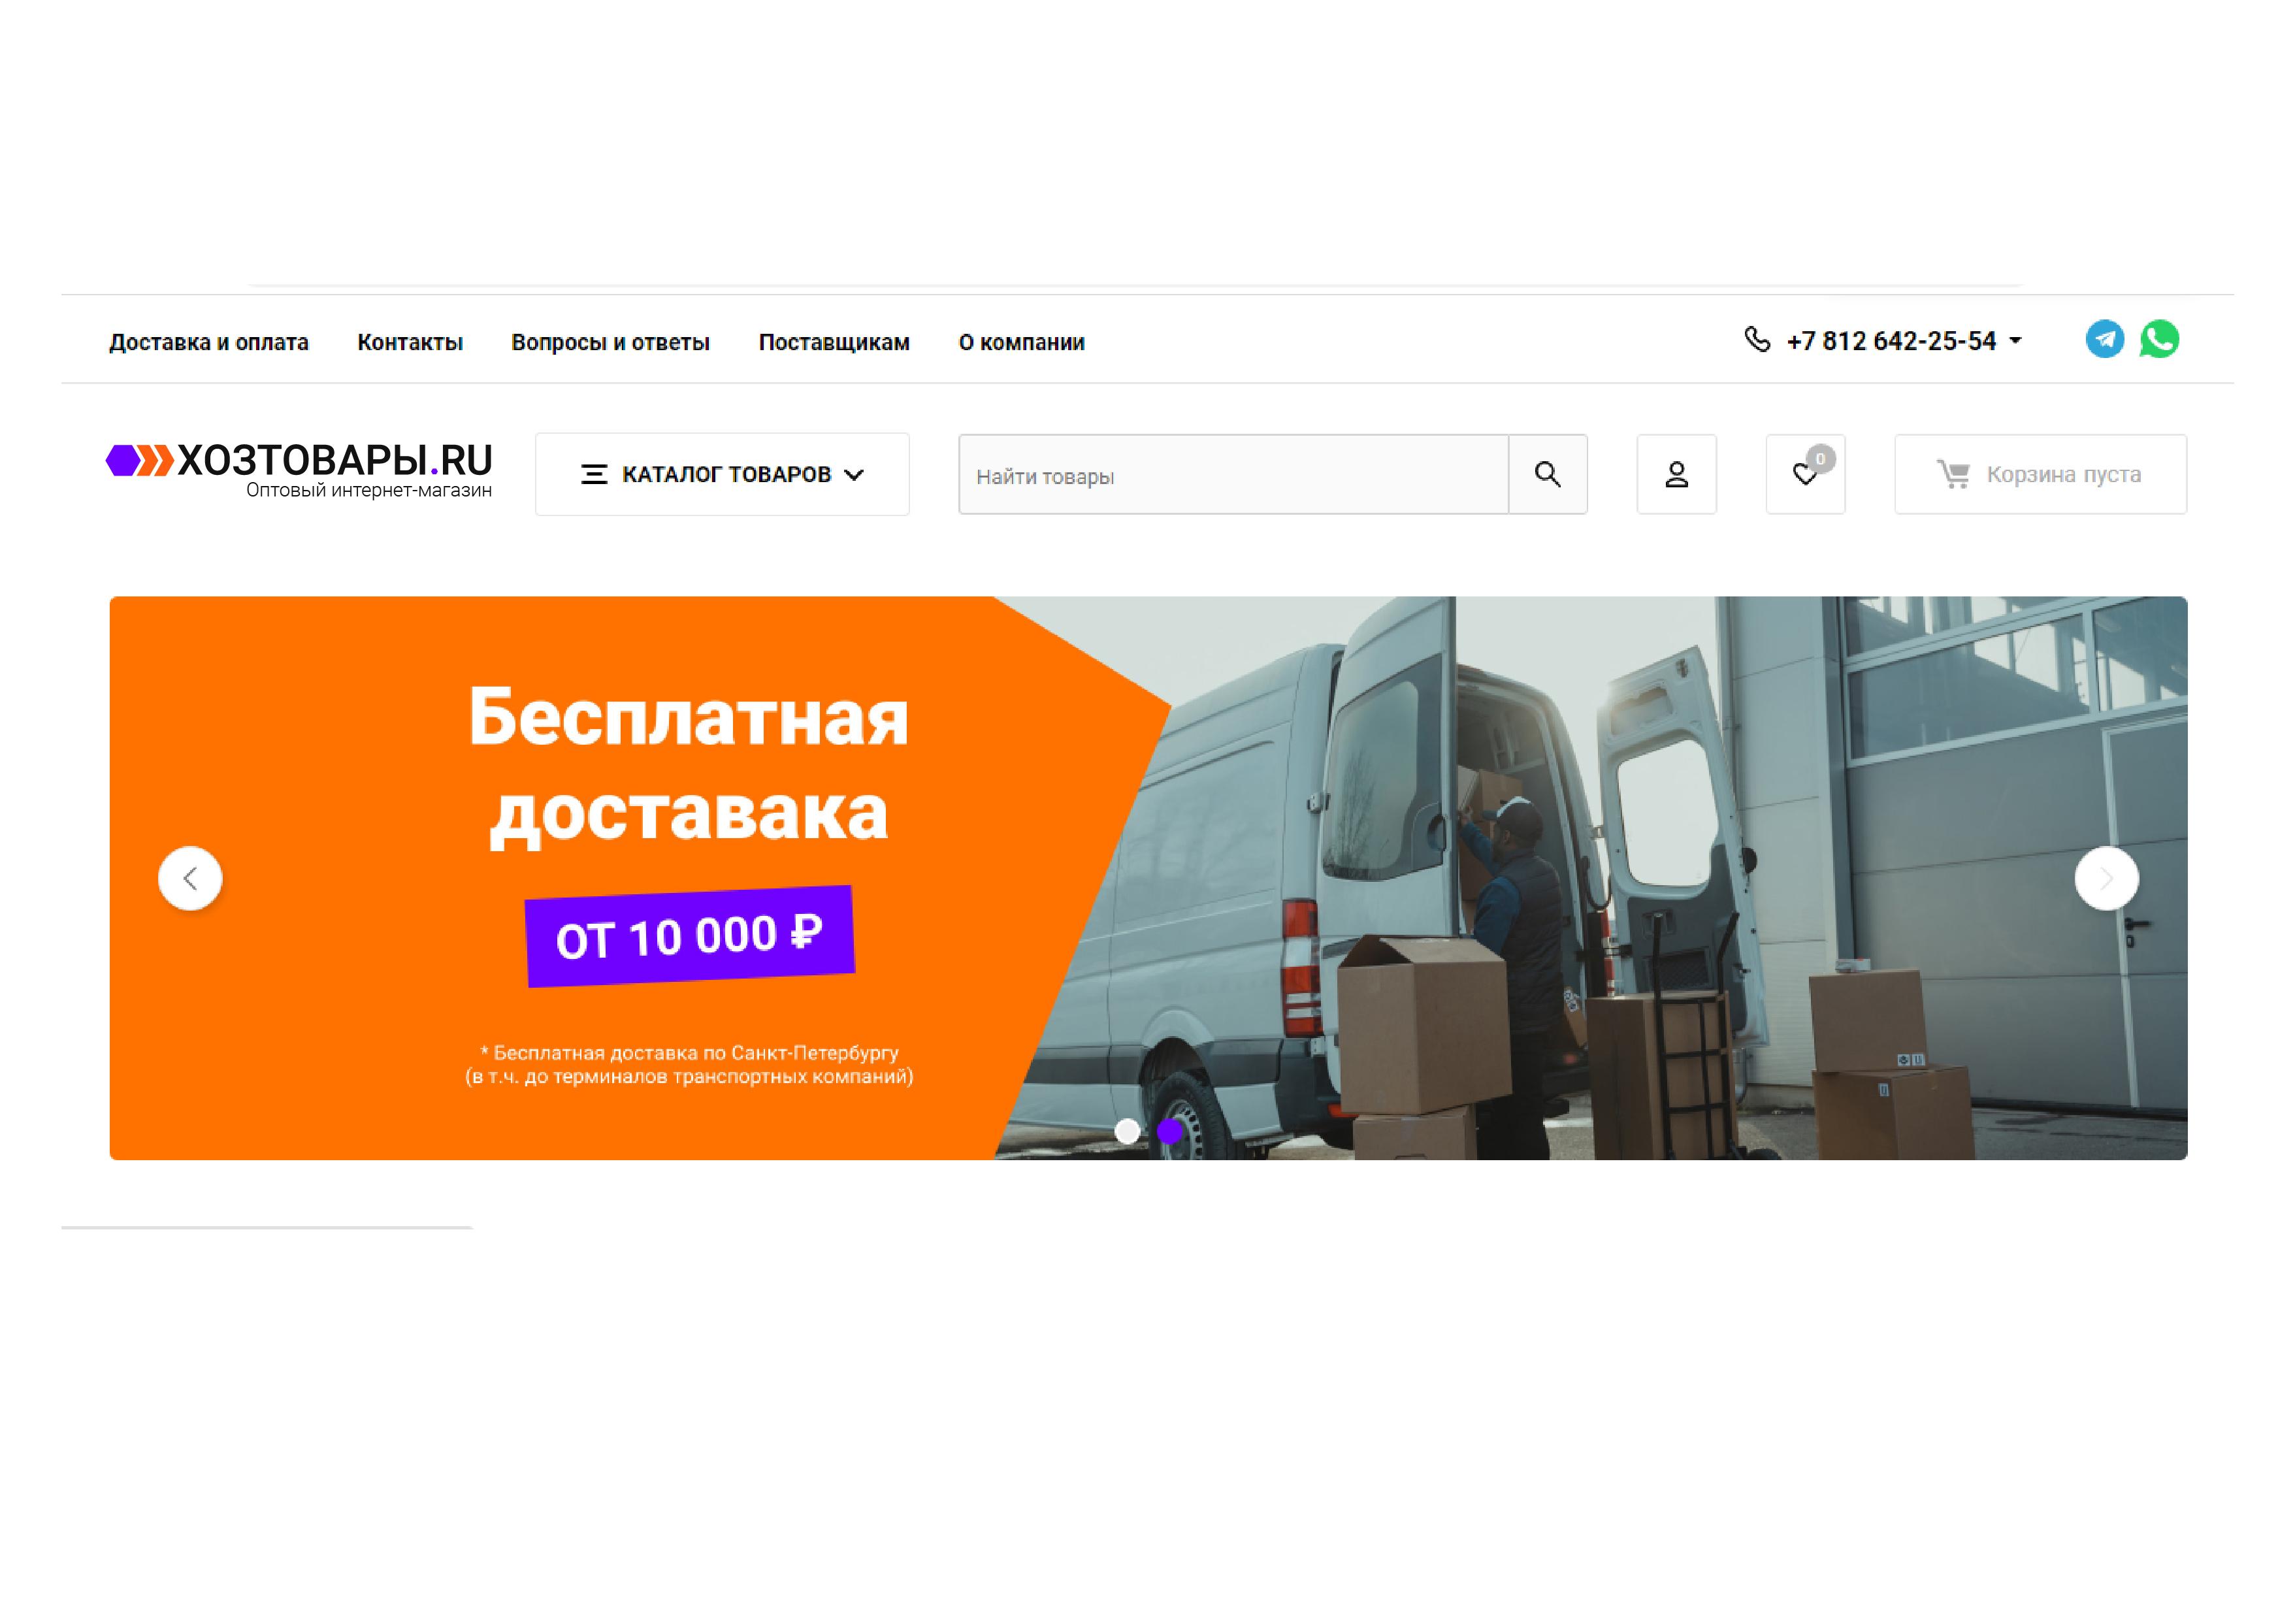 Разработка логотипа для оптового интернет-магазина «Хозтовары.ру» фото f_50060811ecfdbc5d.jpg